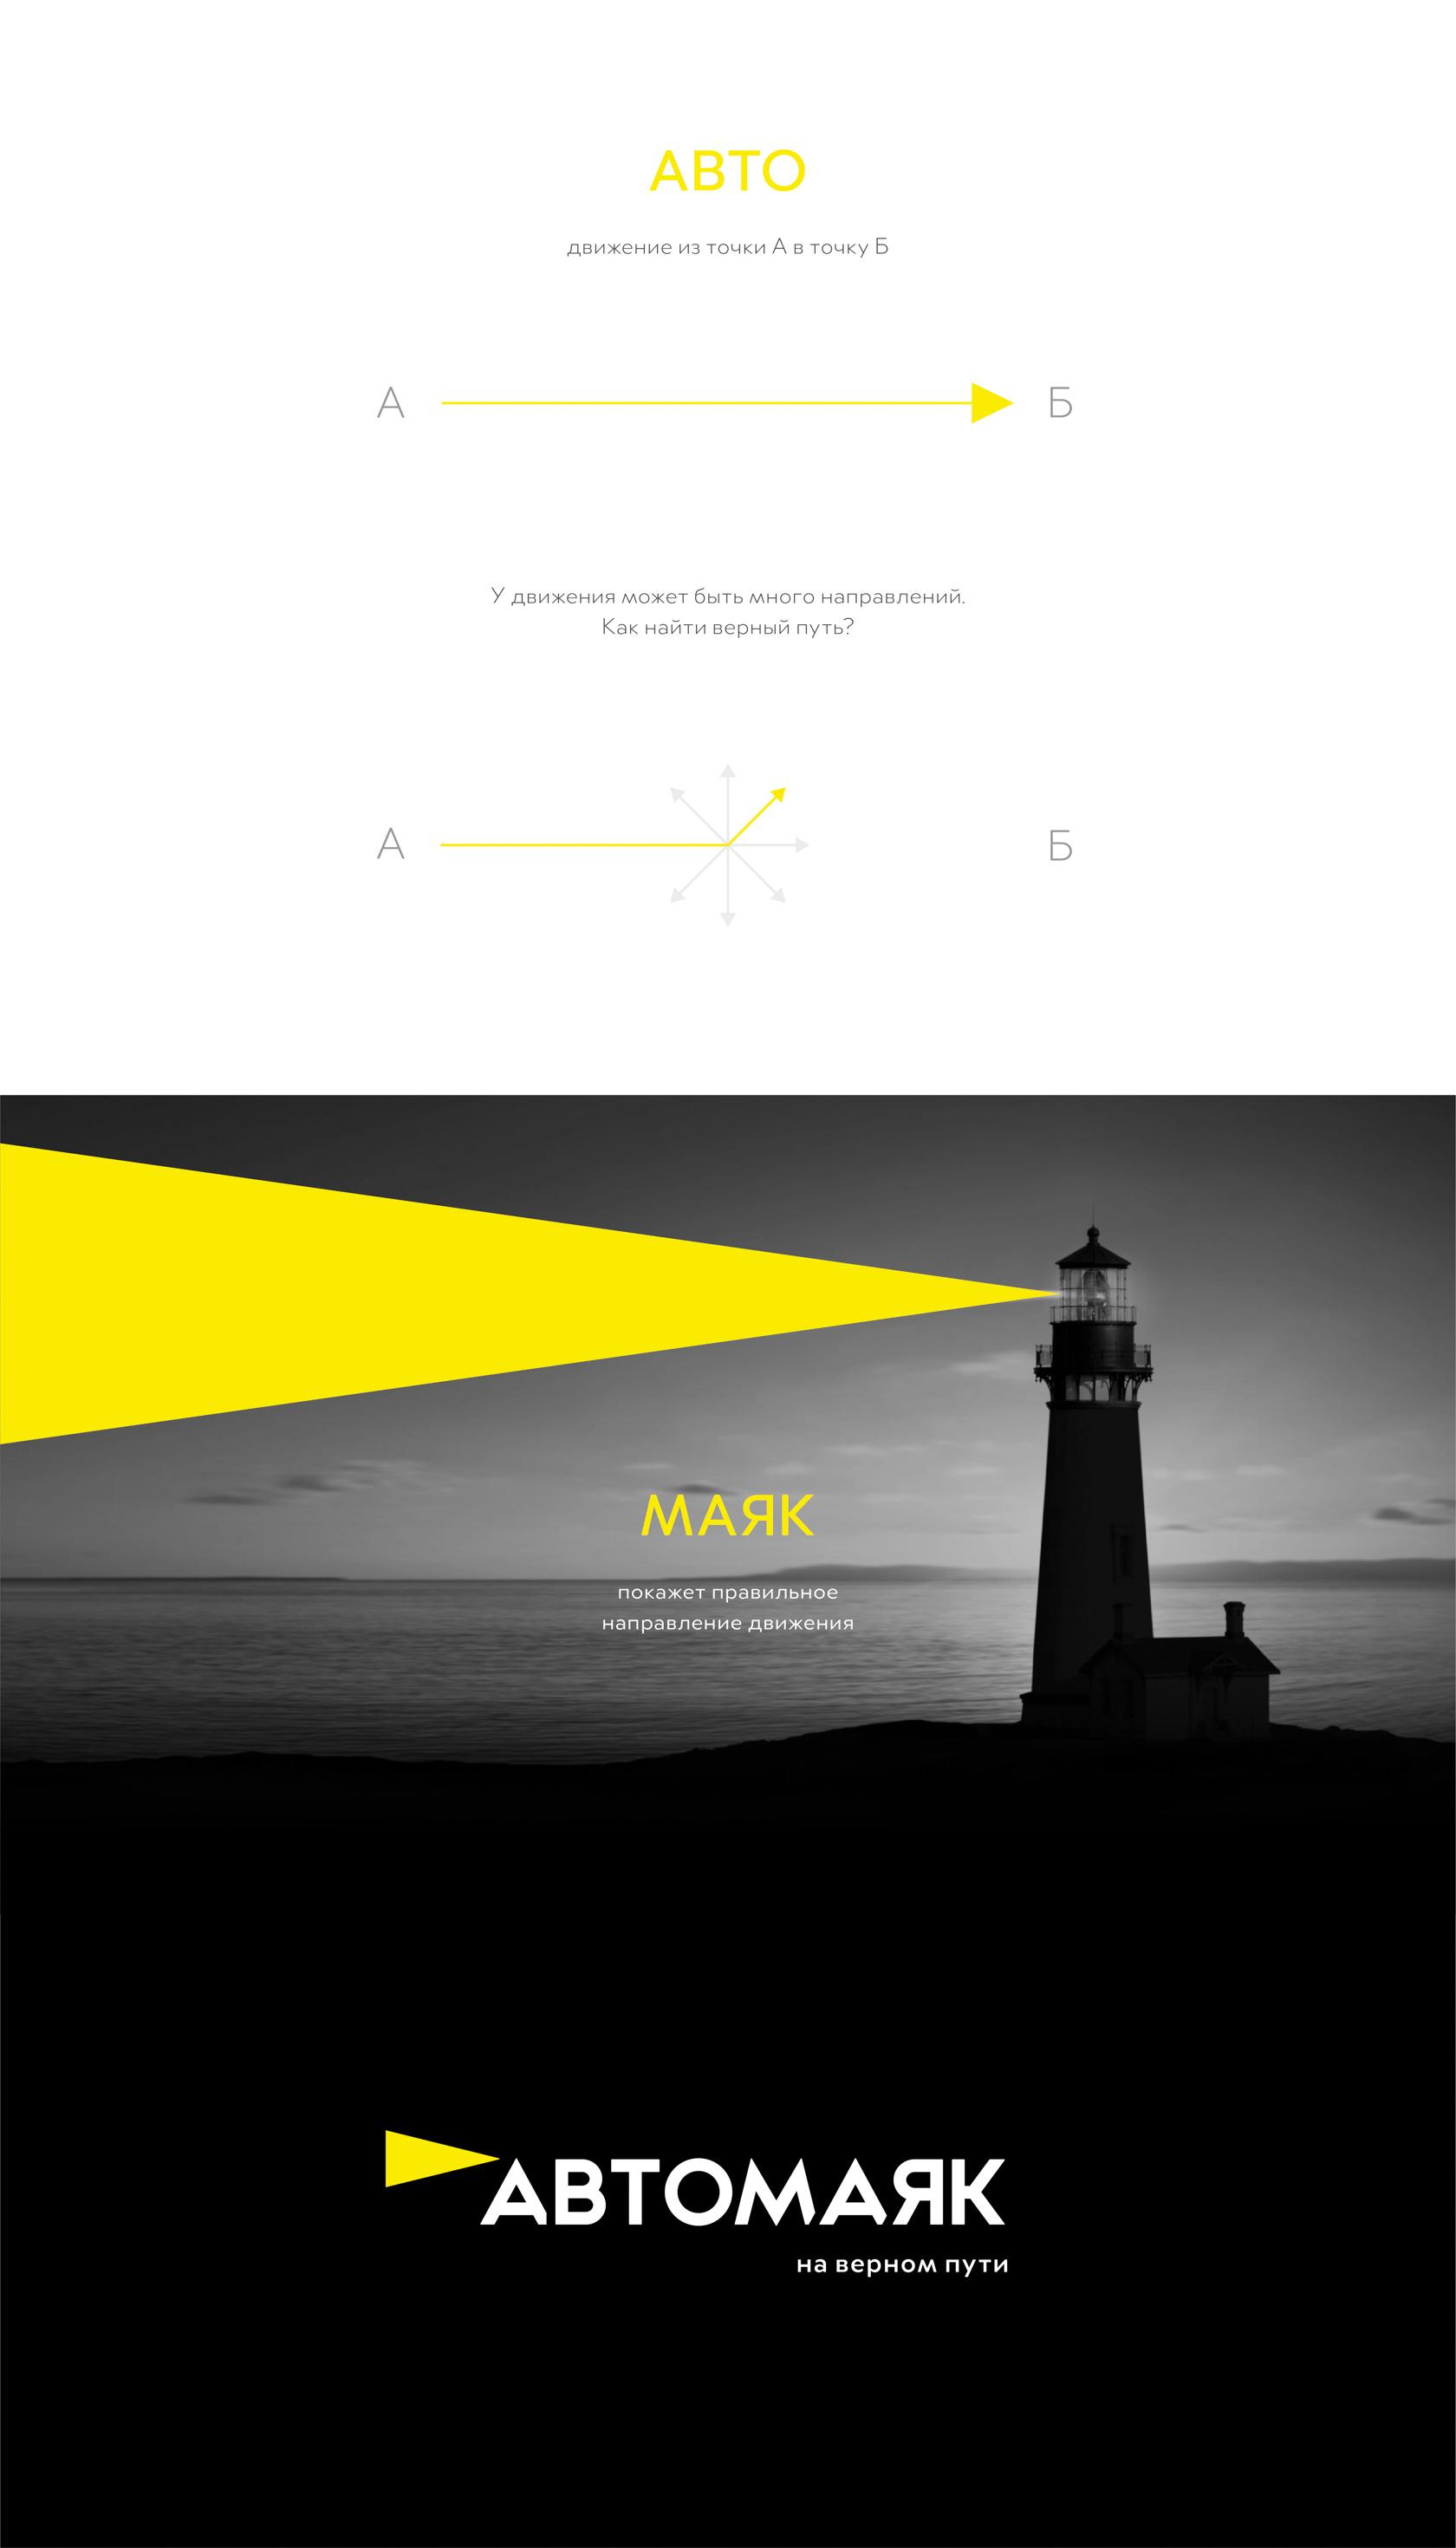 Разработка логотипа, концепция, стратегия, платформа бренда